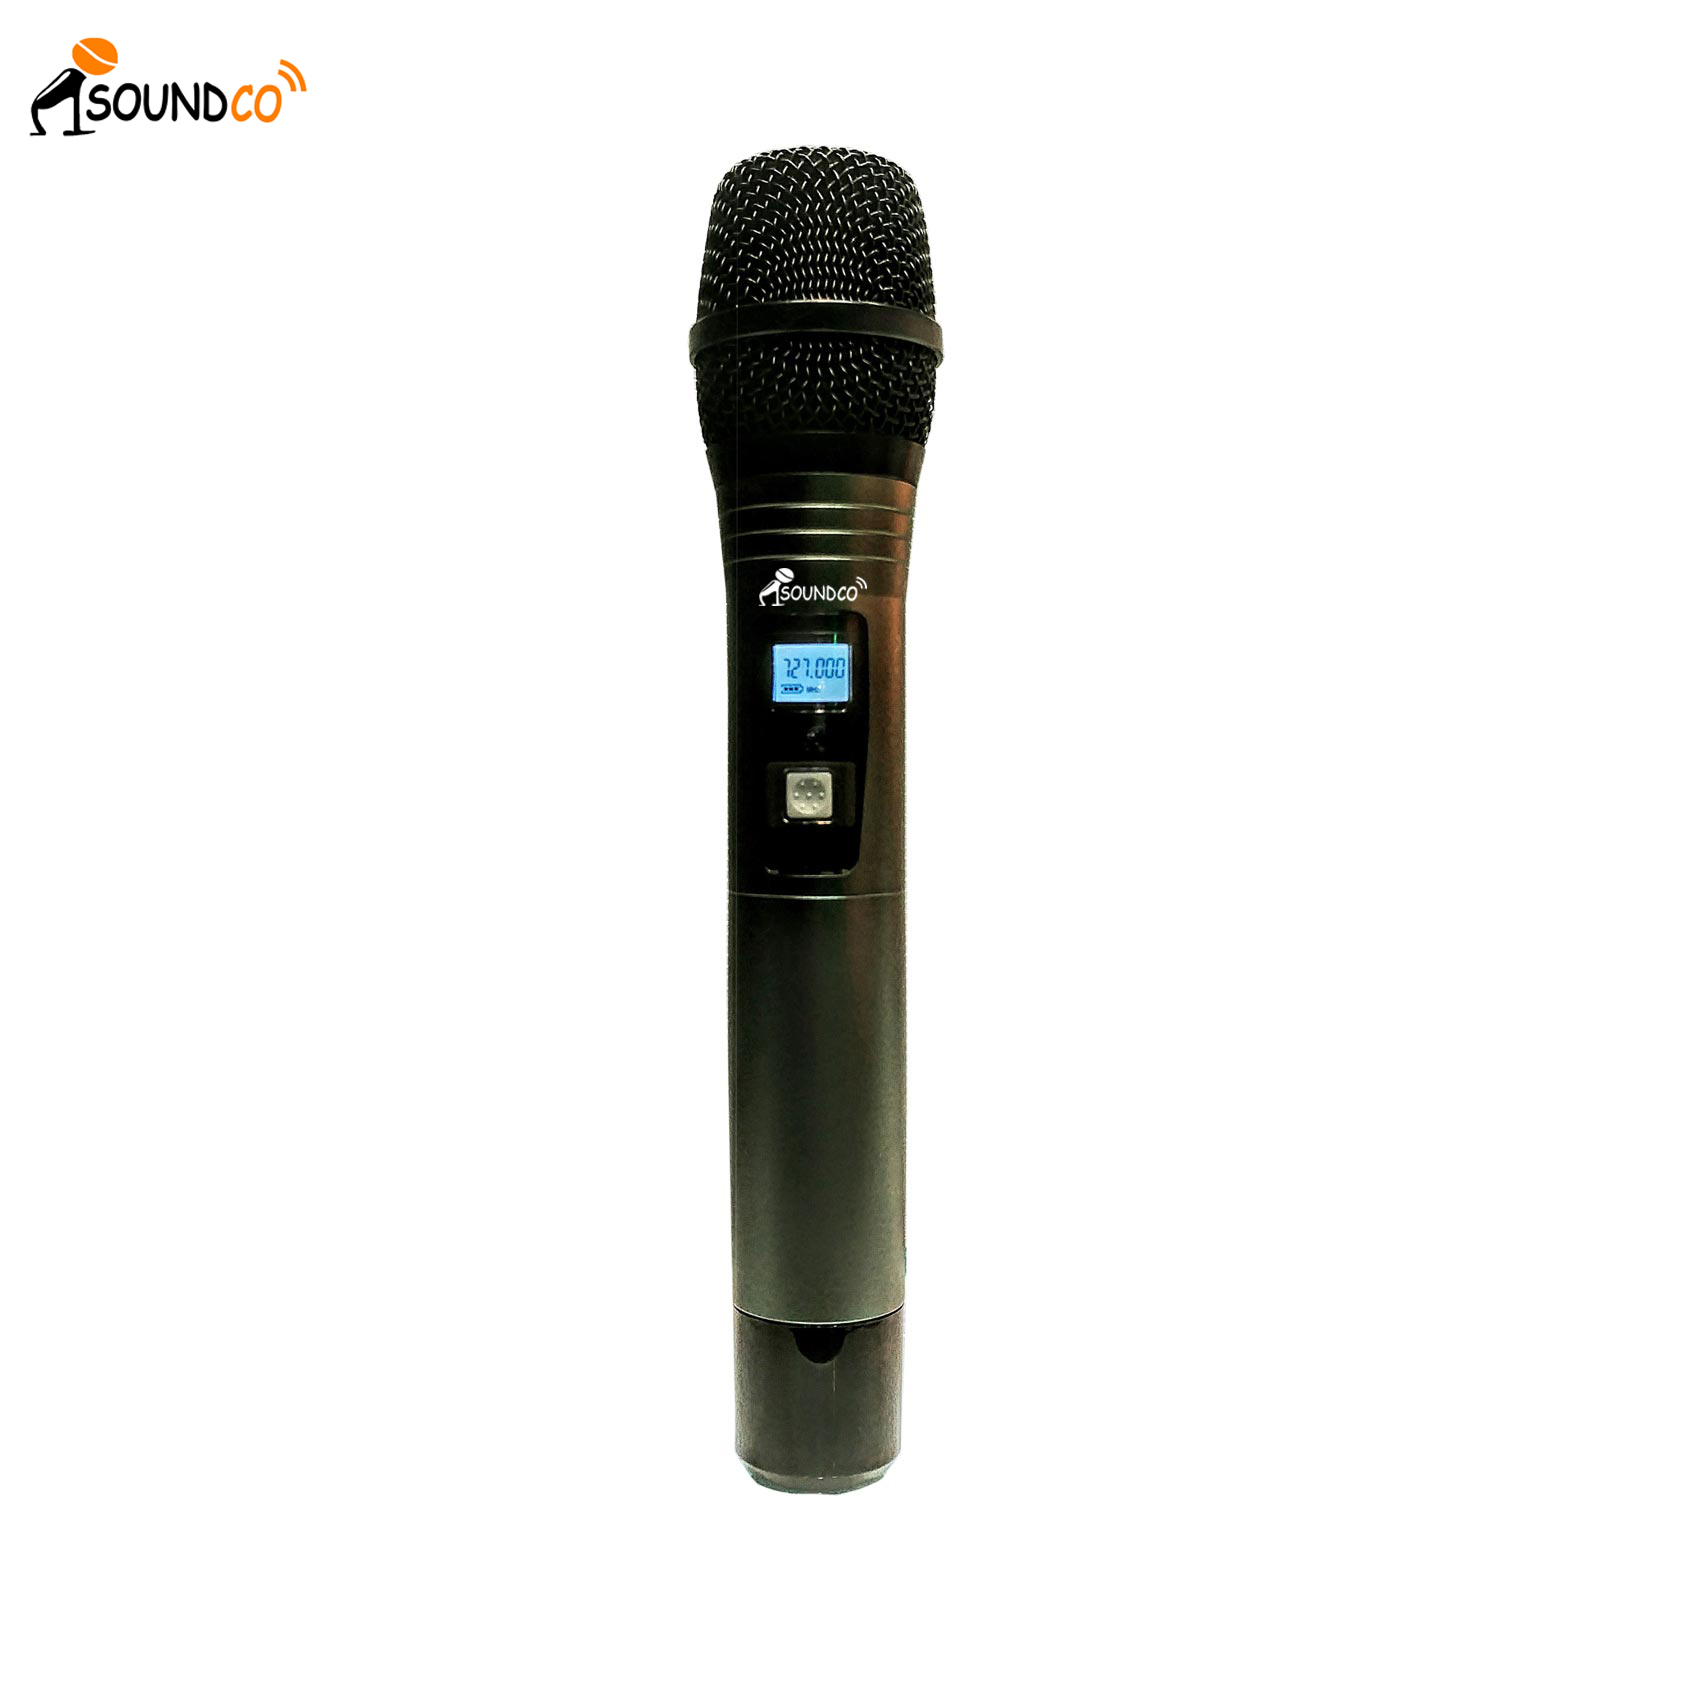 Microphone-31